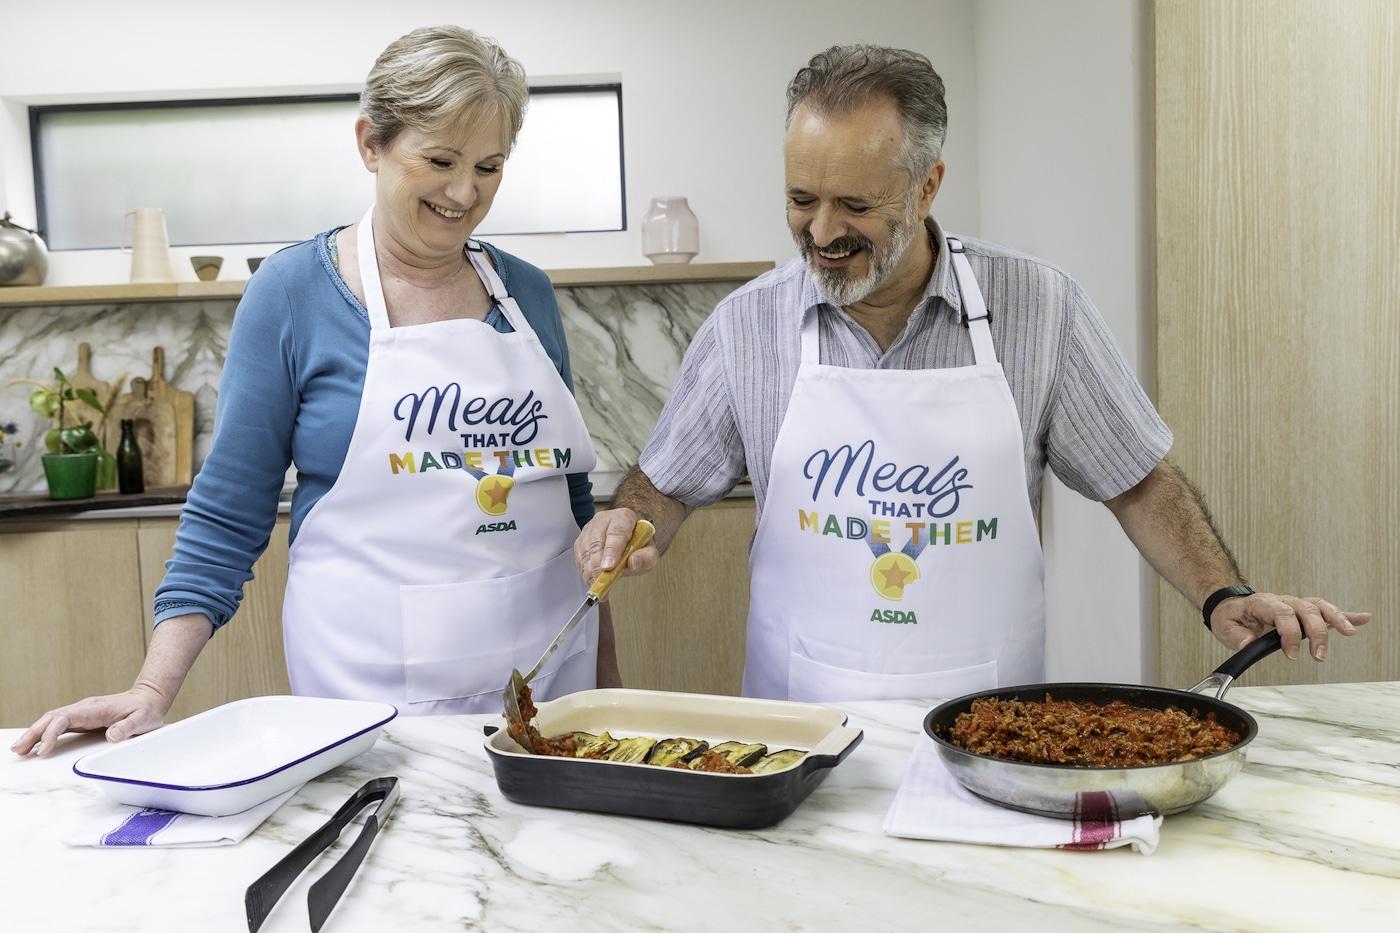 Asda Meals that made them 8